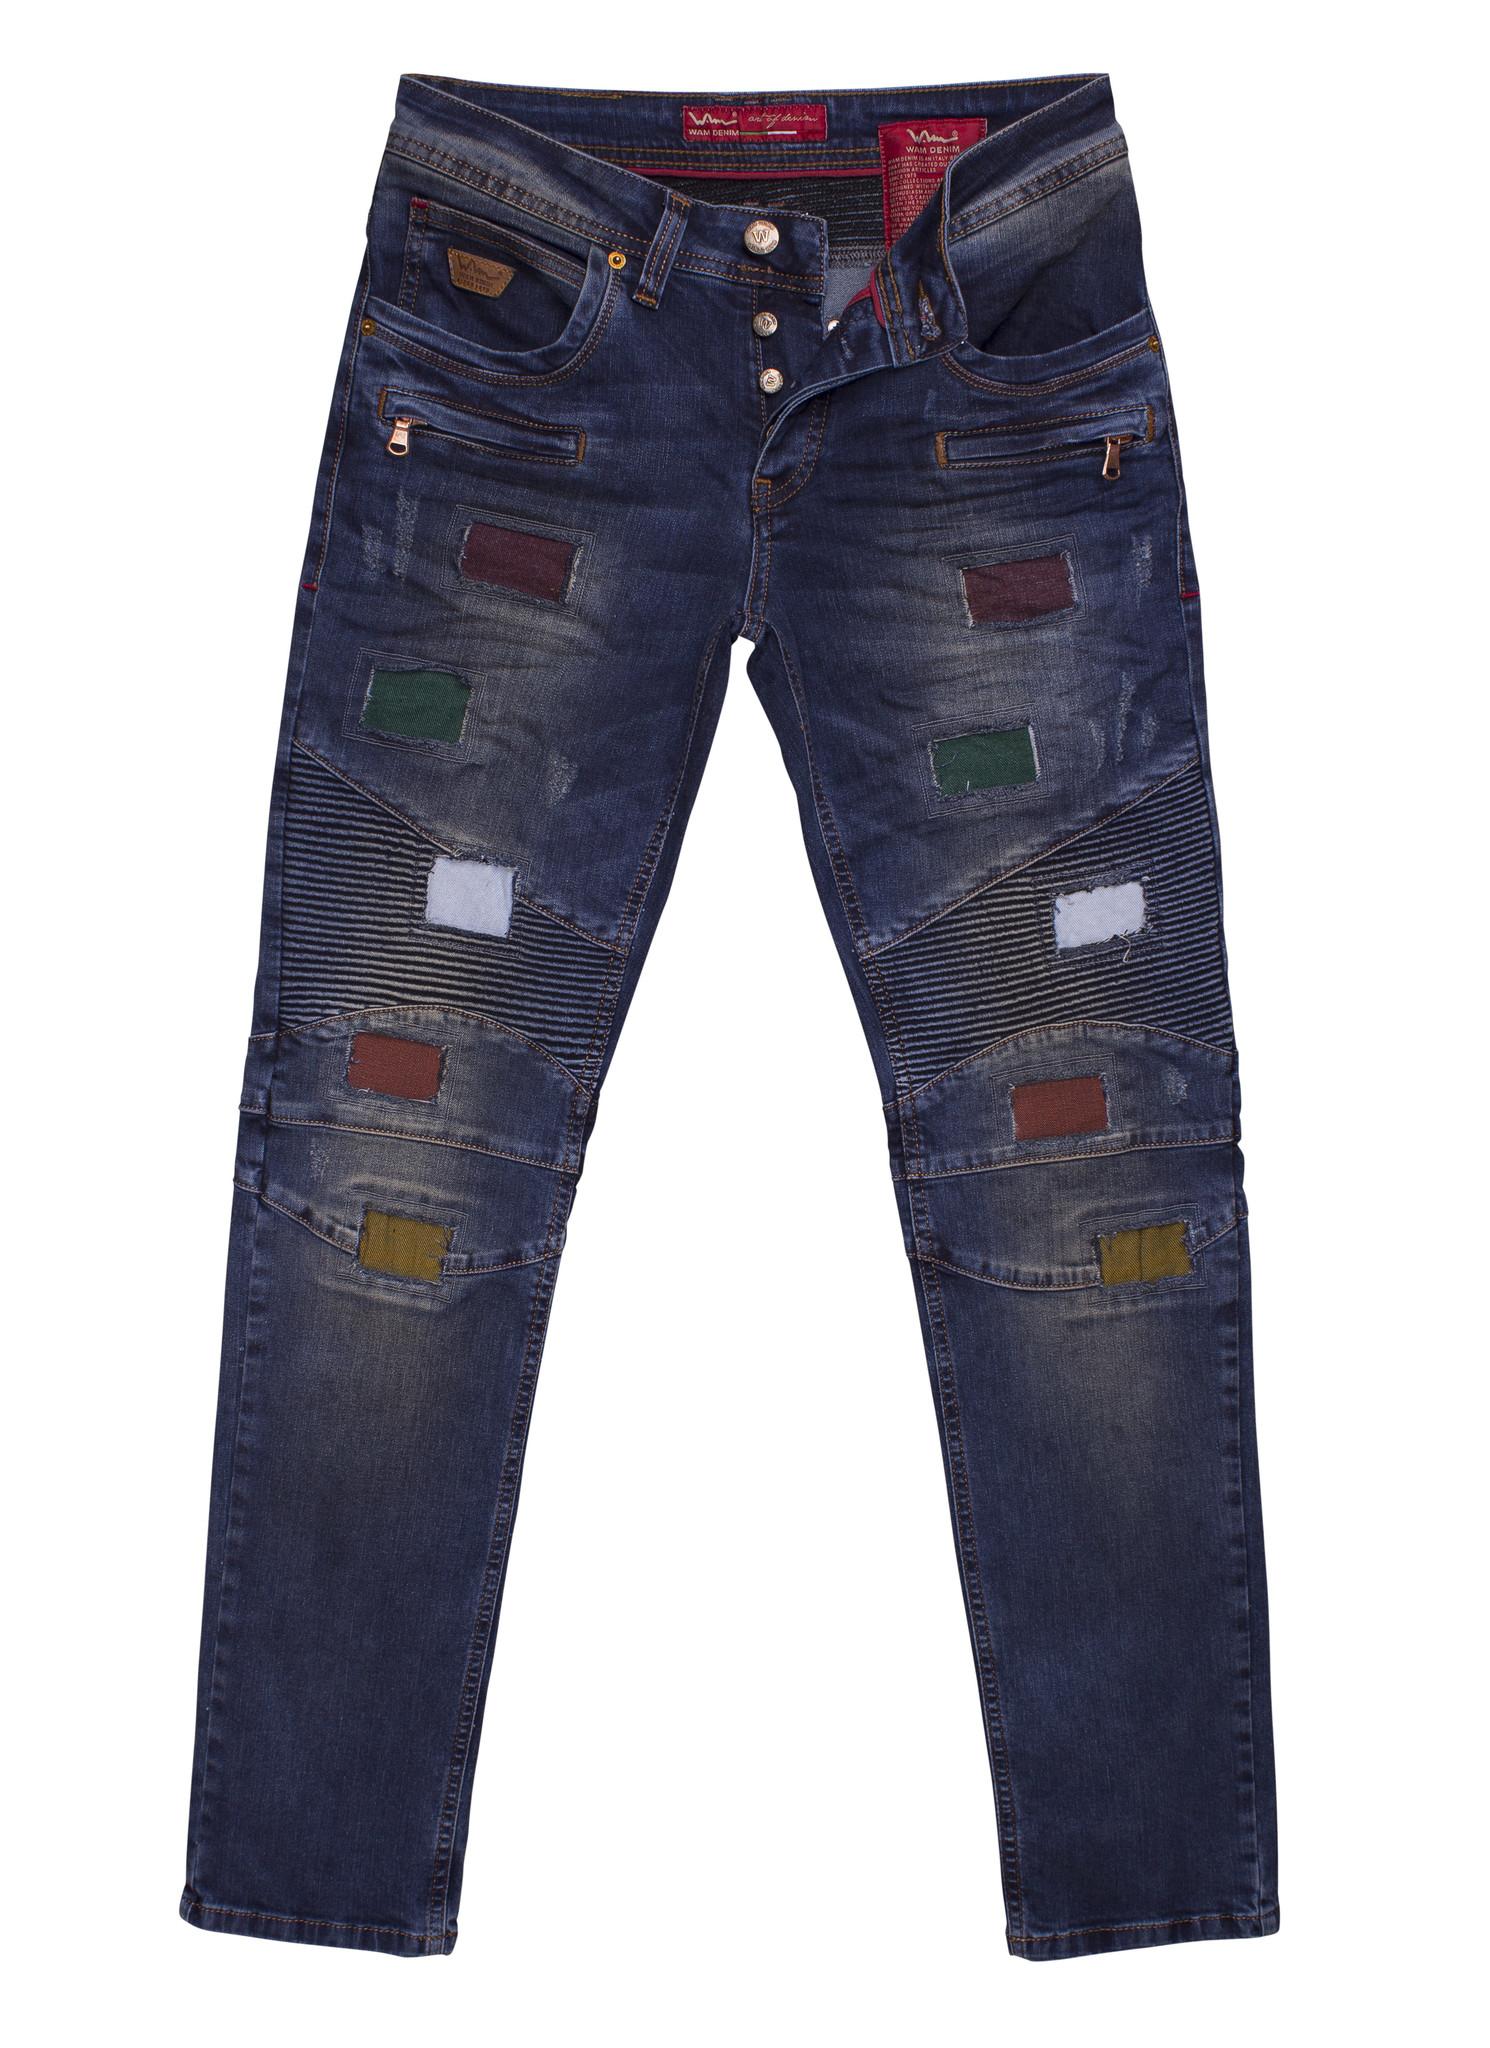 Wam Denim Jeans Tulsa Dark Blue